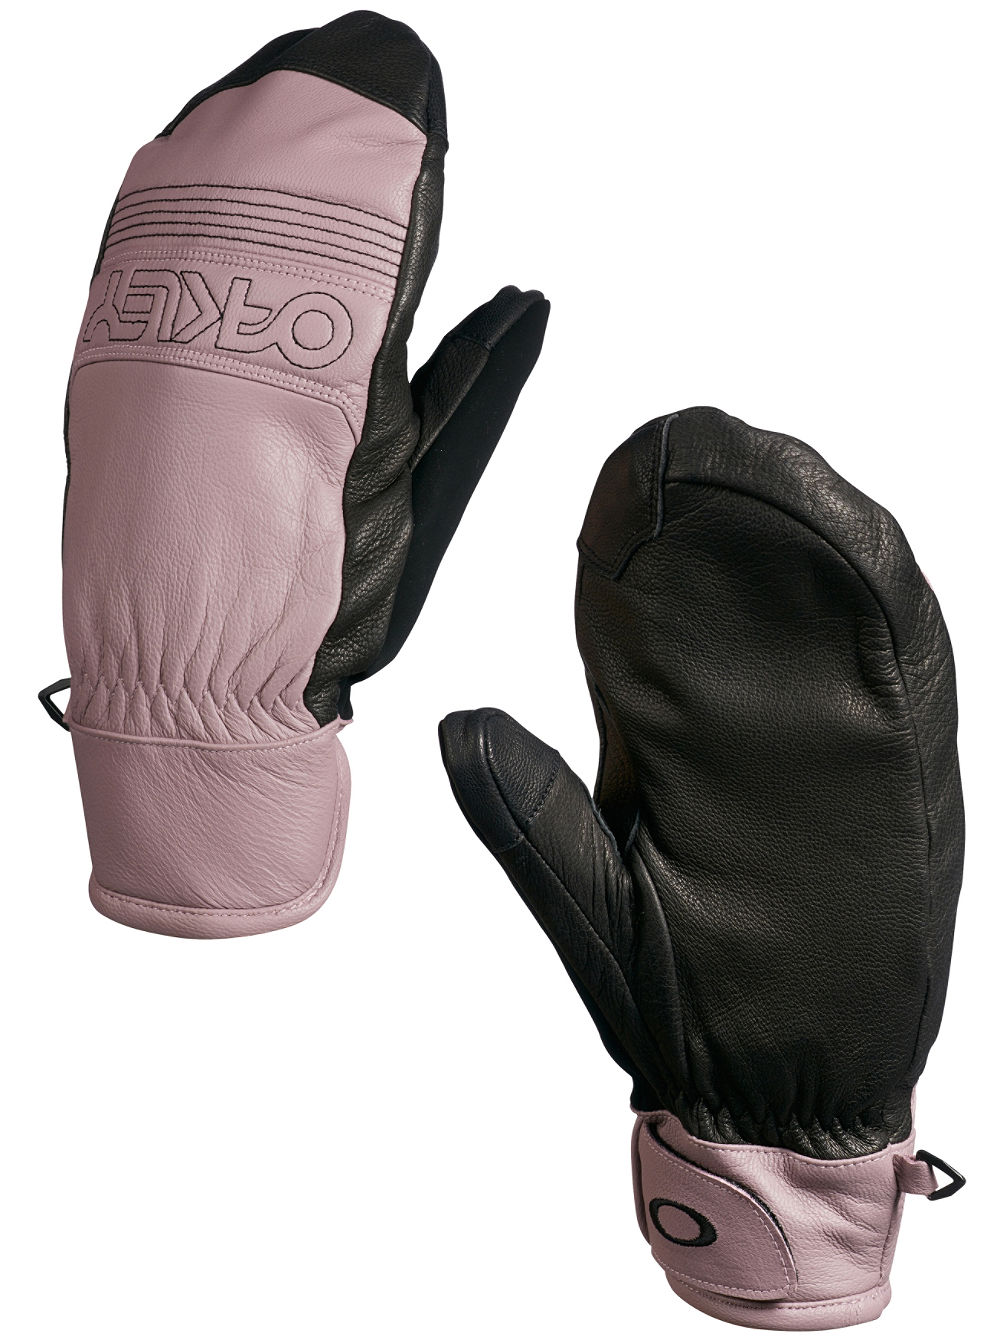 oakley-factory-park-mittens